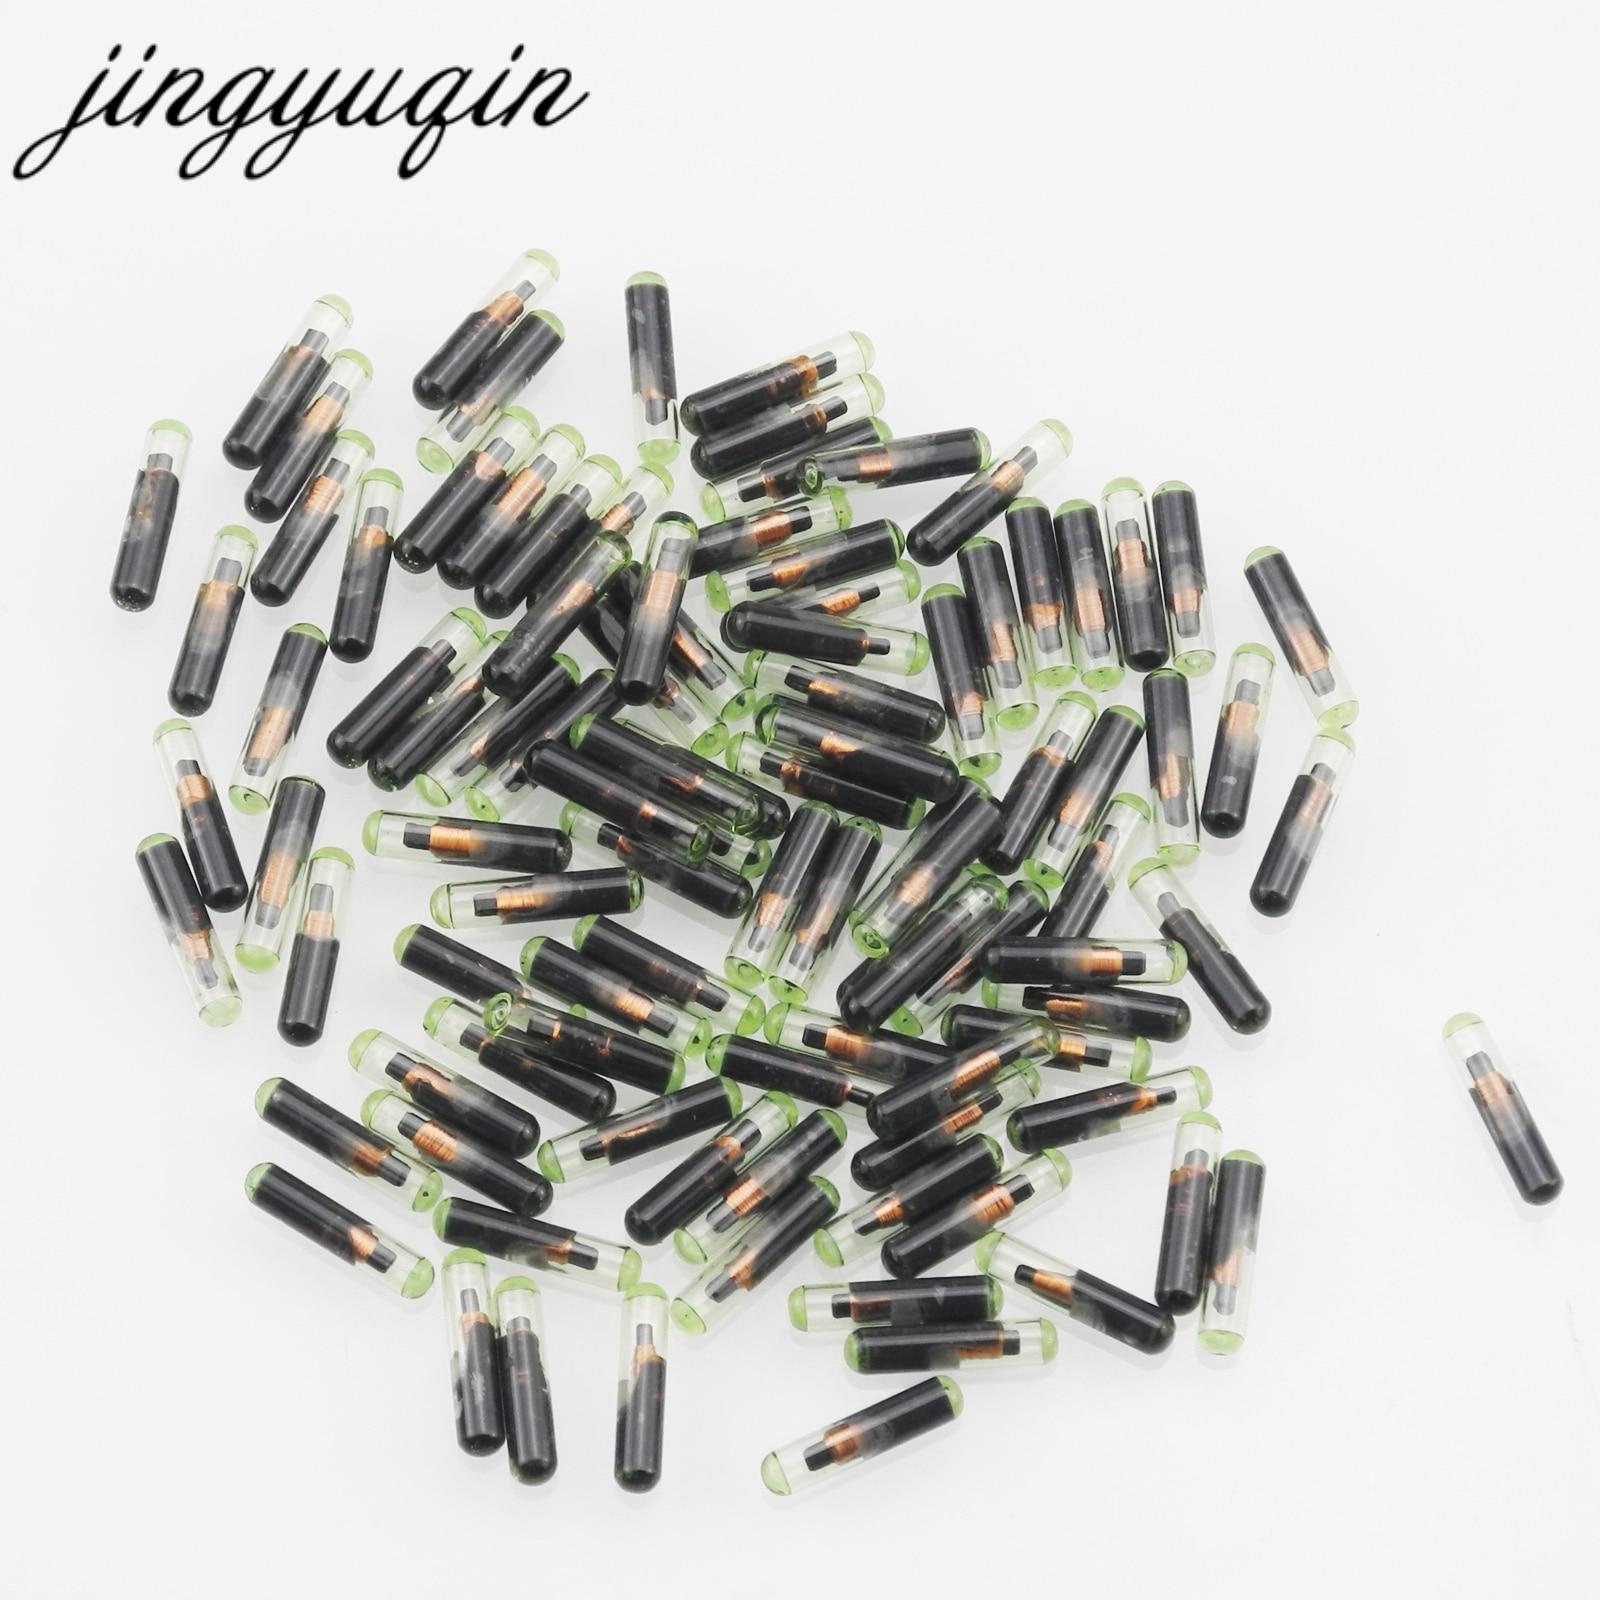 Jingyuqin-10 unids/lote de llave de coche, transpondedor ID48 T6, Chip Crypto desbloqueado...